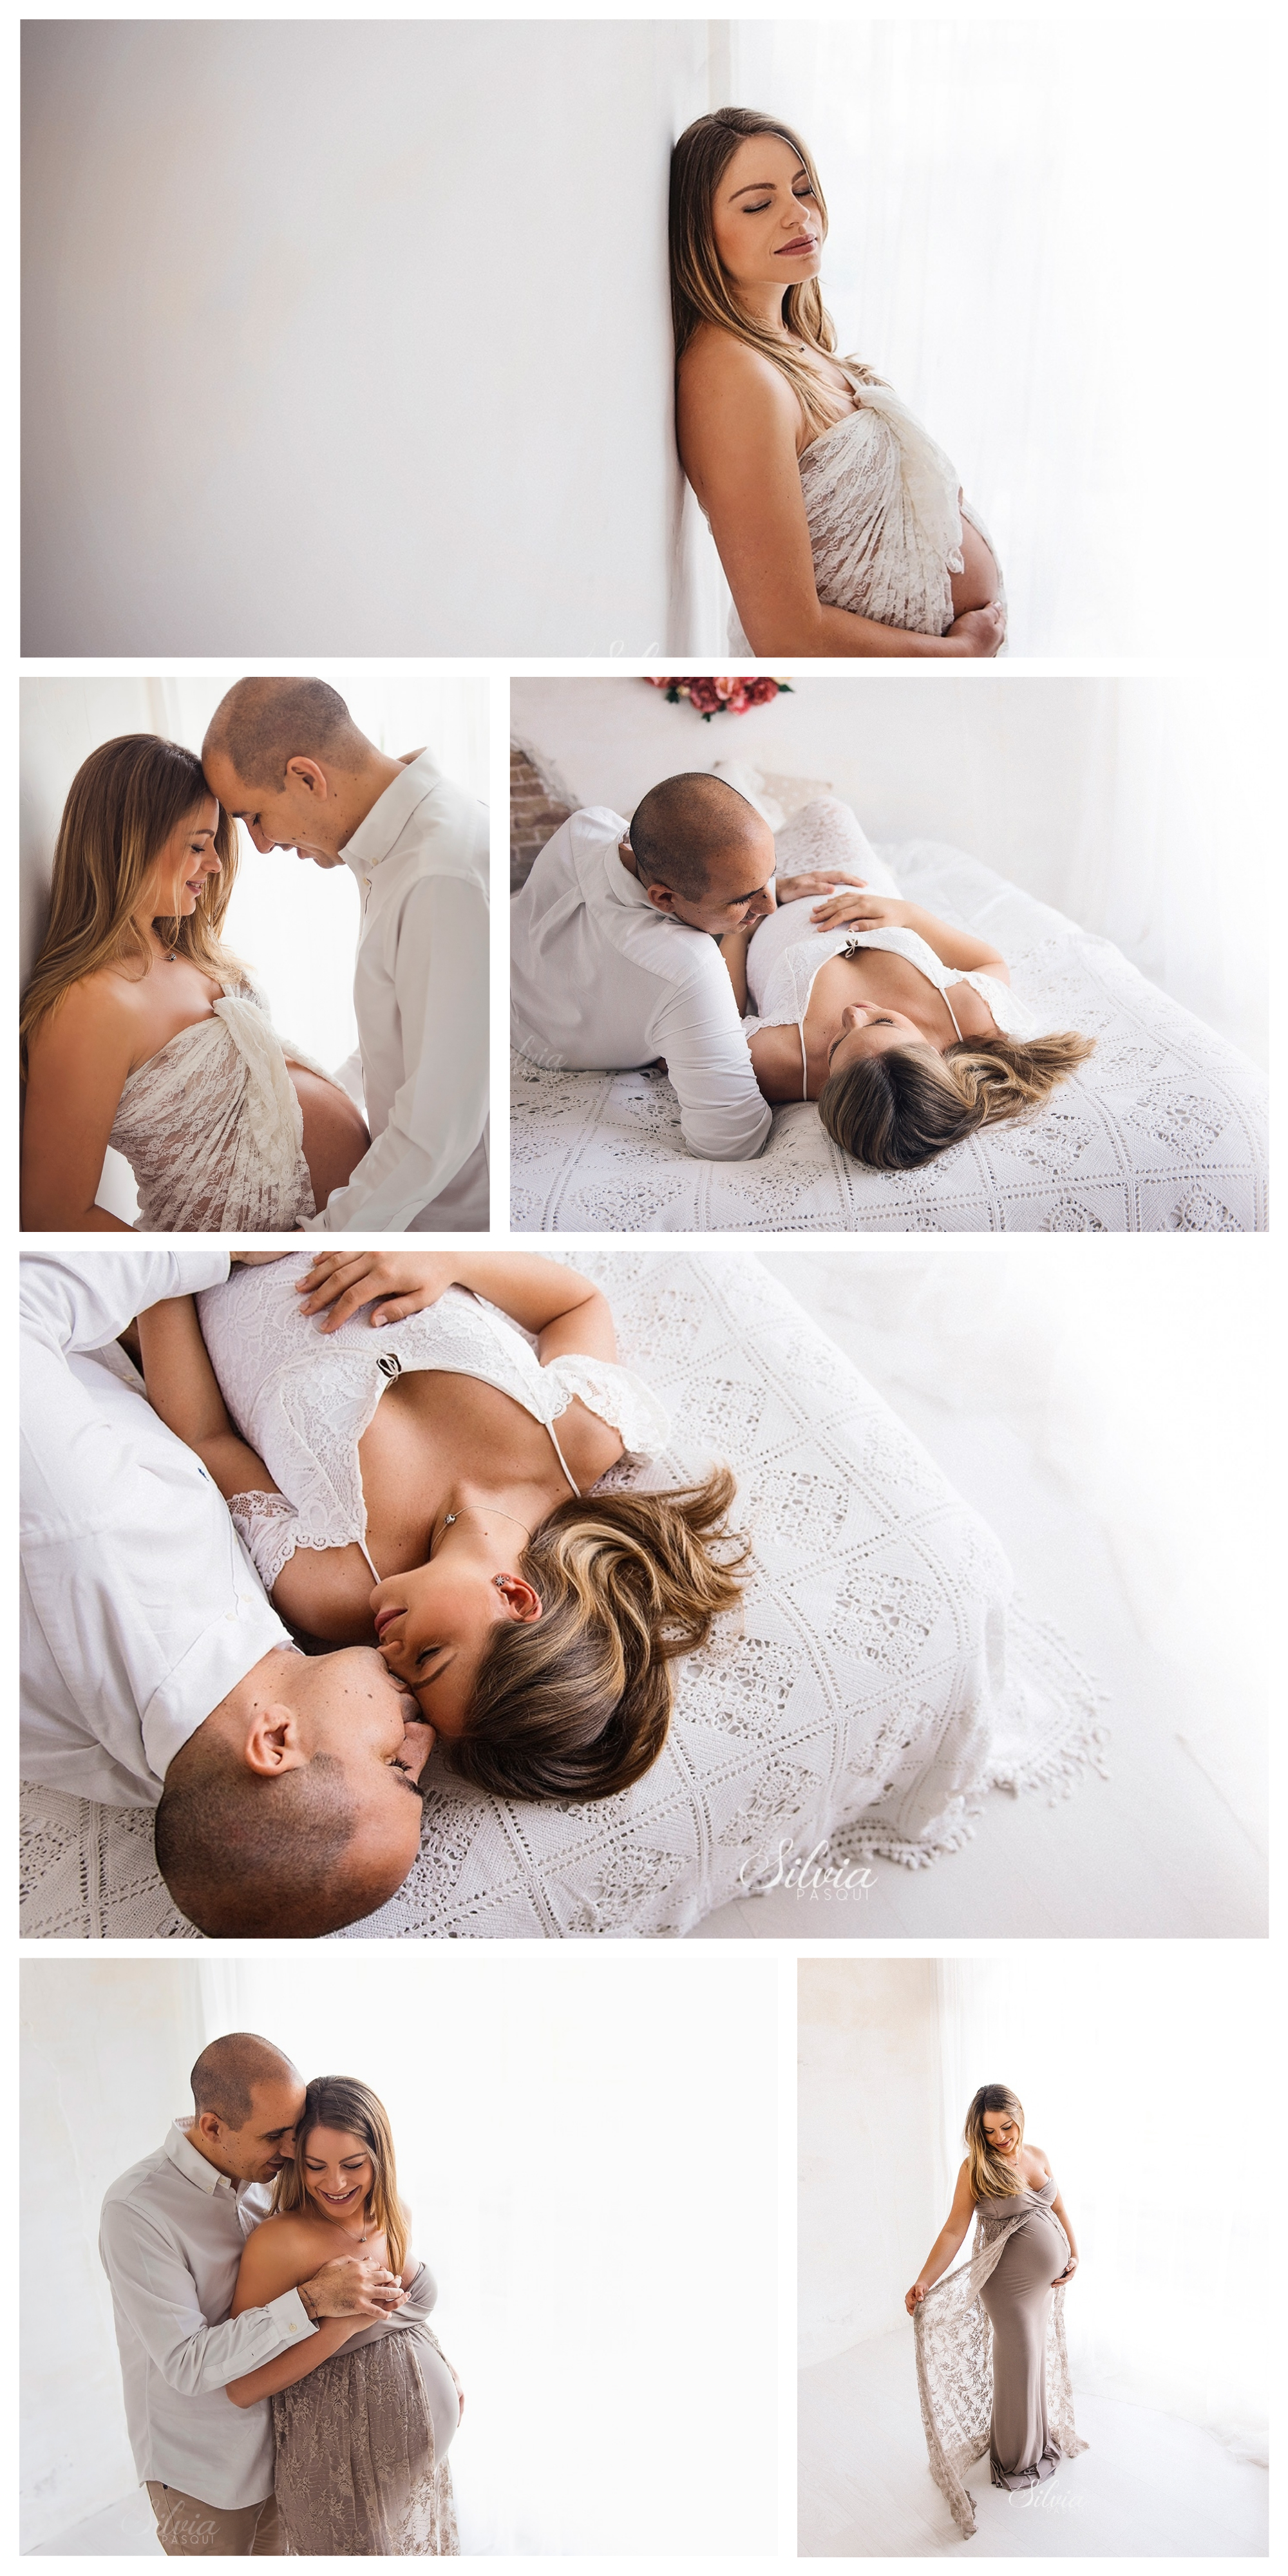 fotografa foto gravidanza